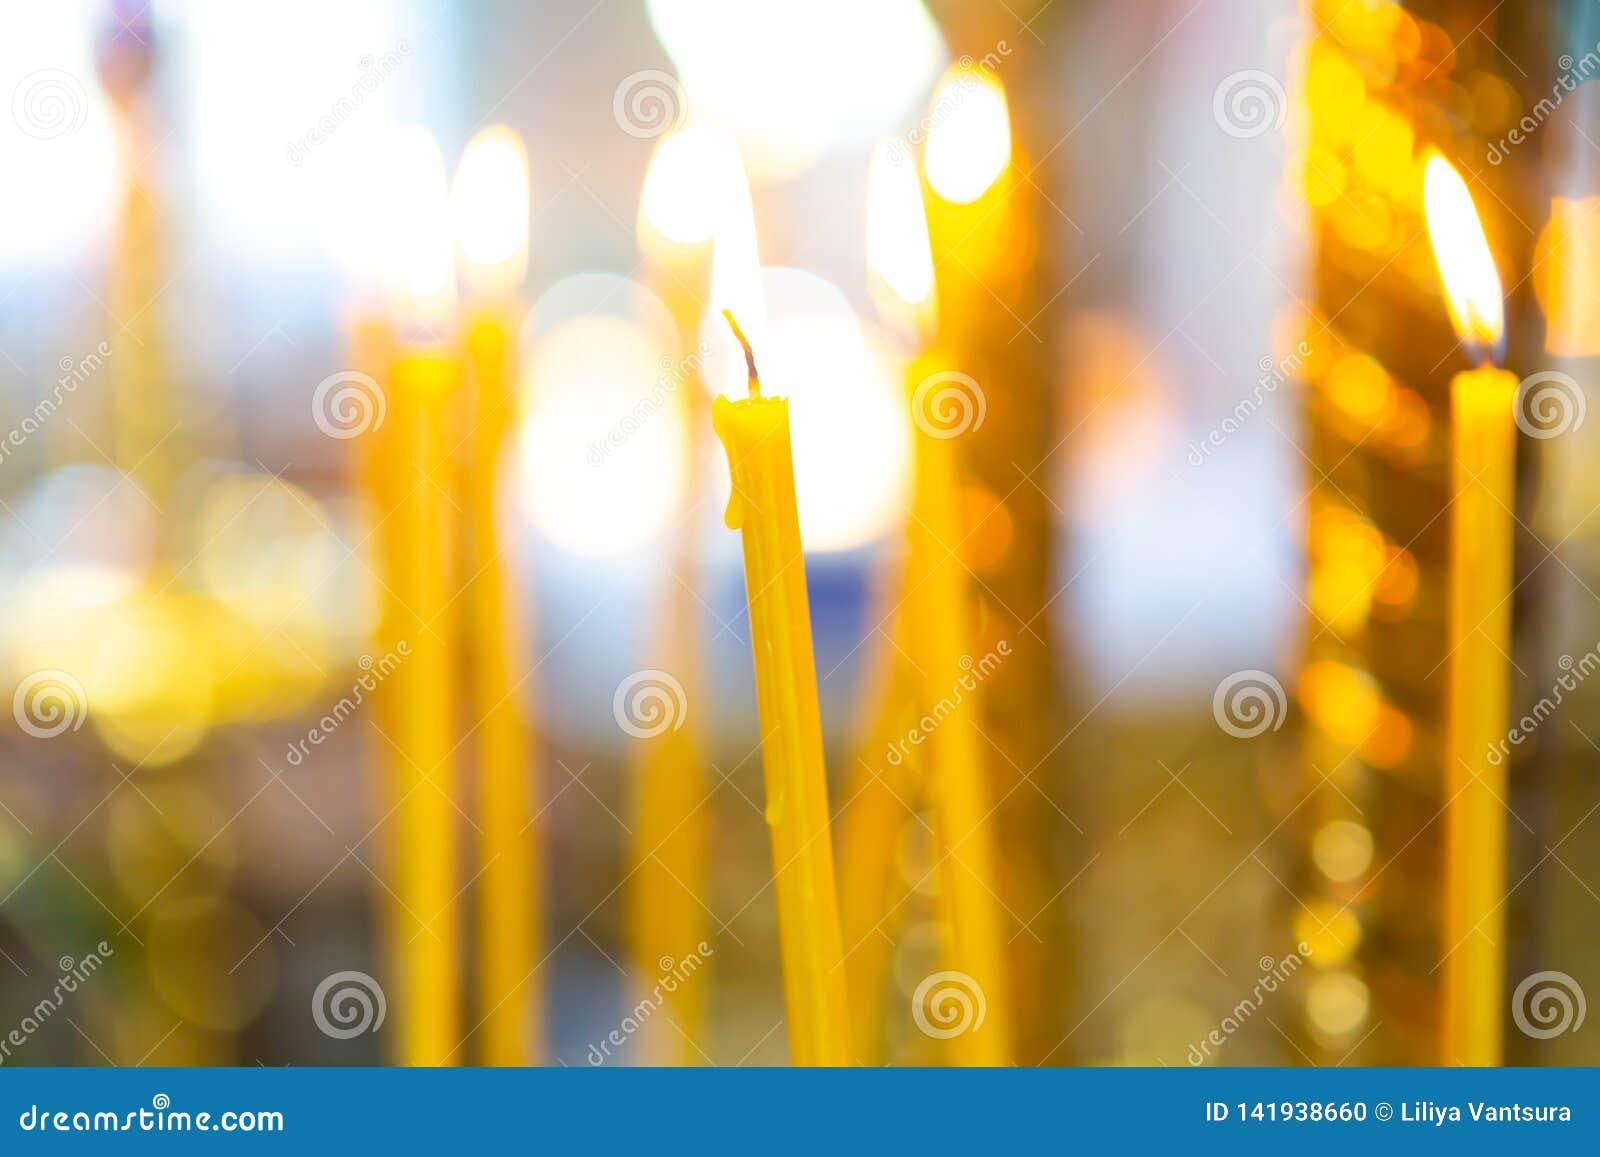 Velas de la quemadura natural de la cera en la iglesia